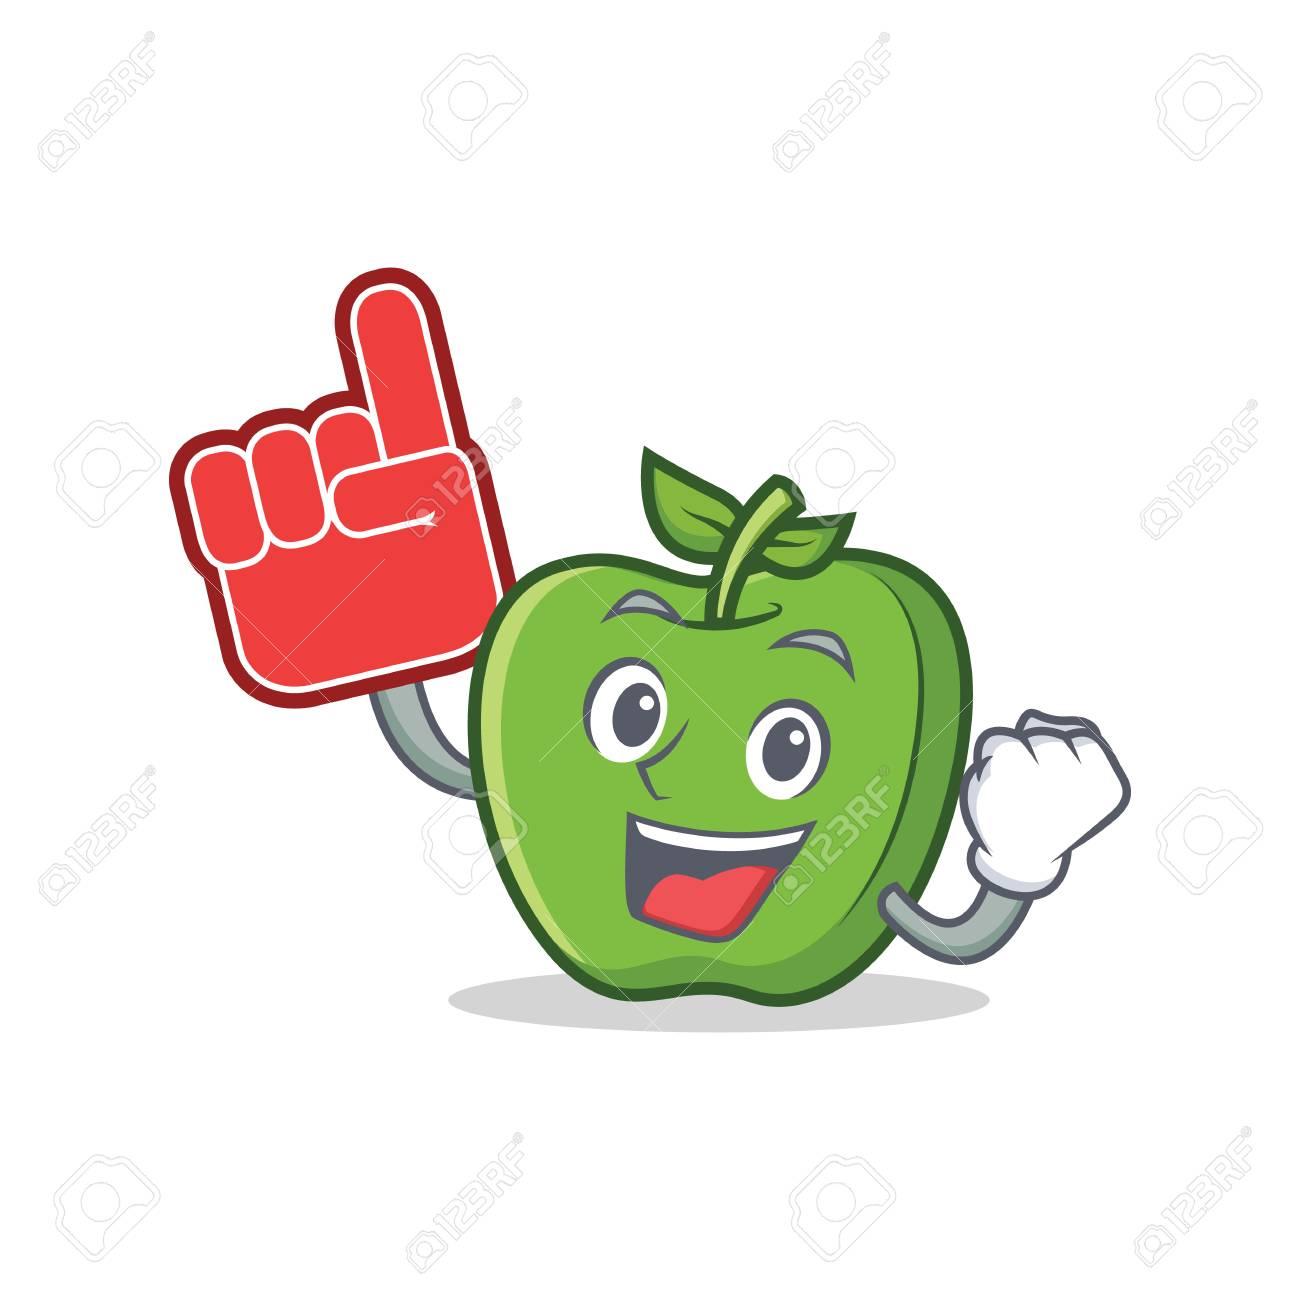 Foam finger green apple character cartoon vector illustration - 83544349